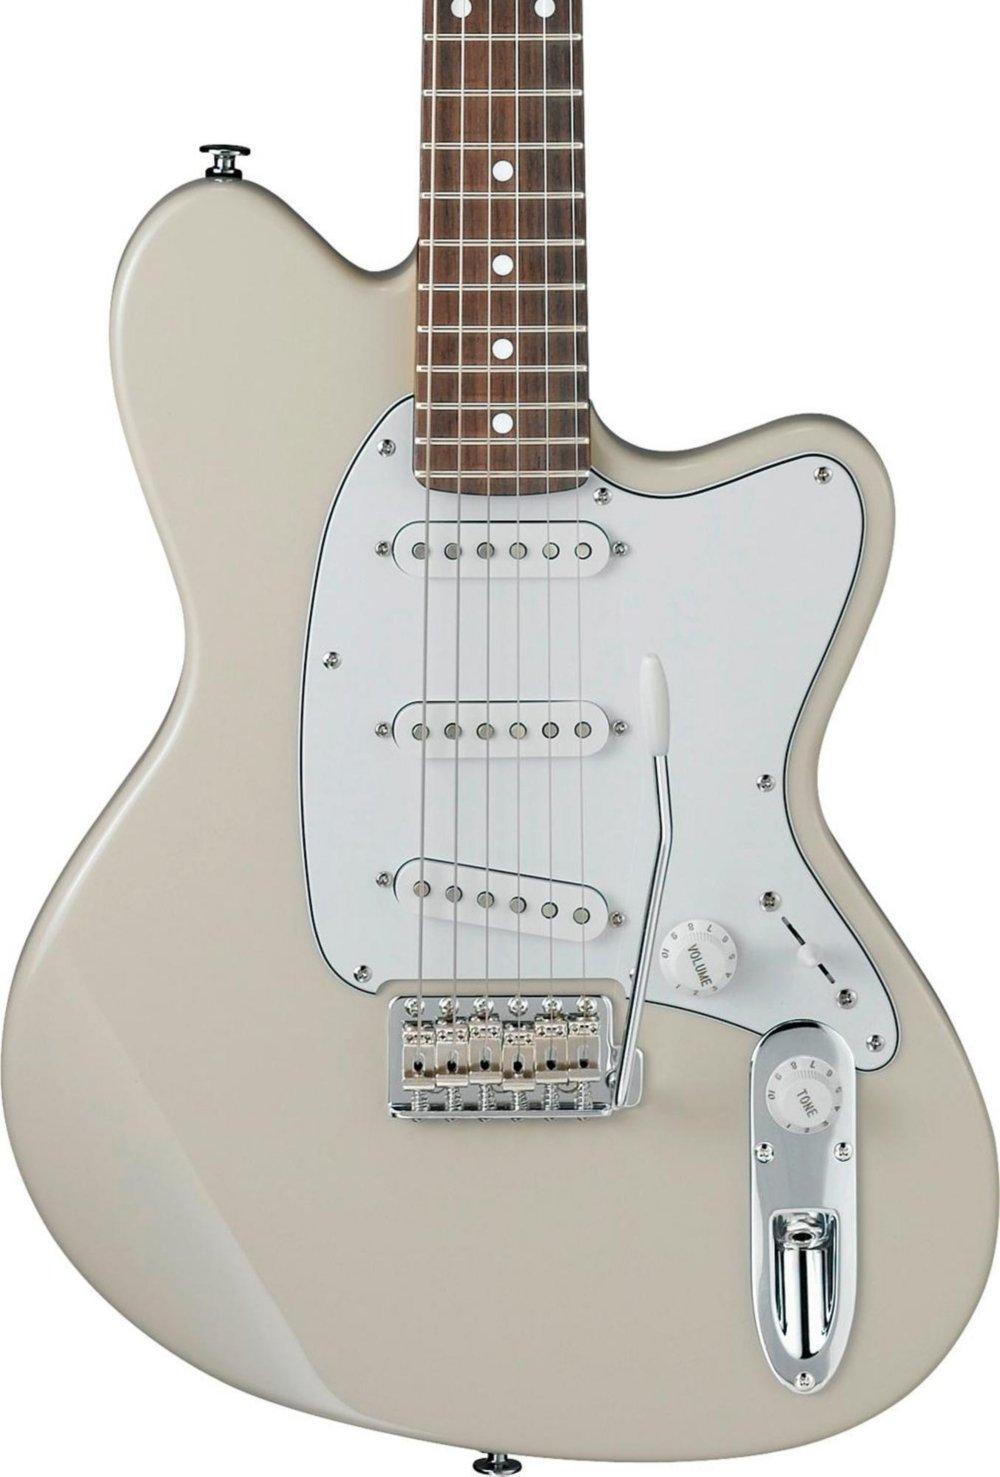 Ibanez tm1730 Talman Prestige guitarra eléctrica: Amazon.es ...